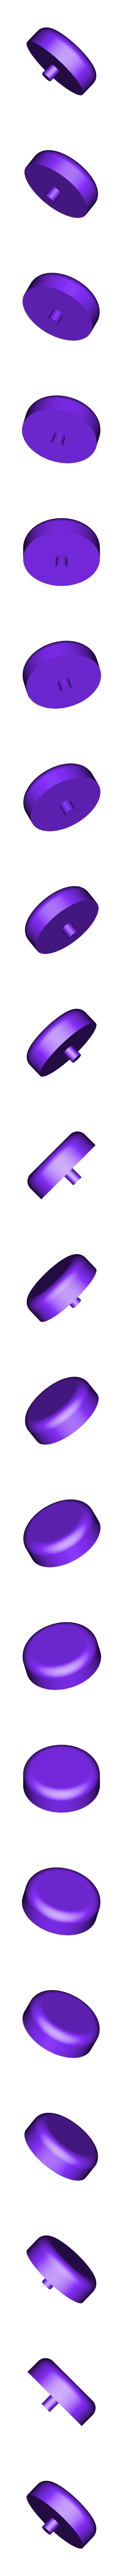 petal-poleB2.stl Download free STL file Mechnolia • 3D printing template, ChrisBobo